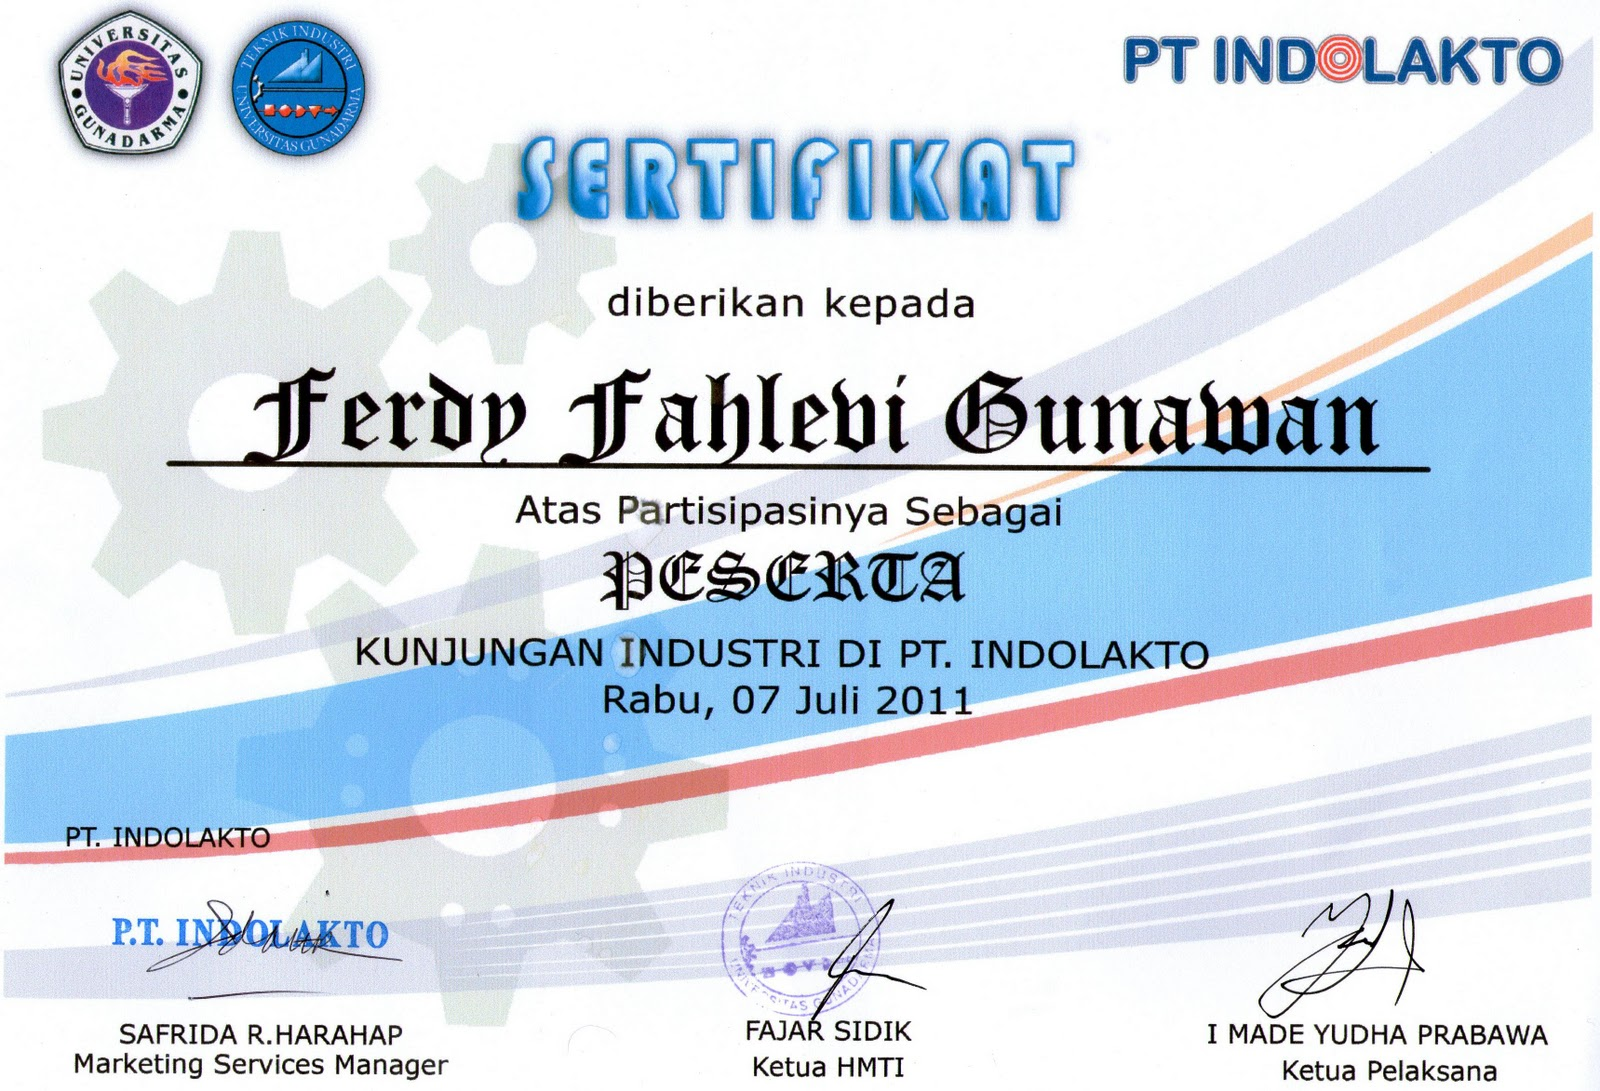 Welcome To Gunawan Corp Kumpulan Sertifikat Dari Kampus